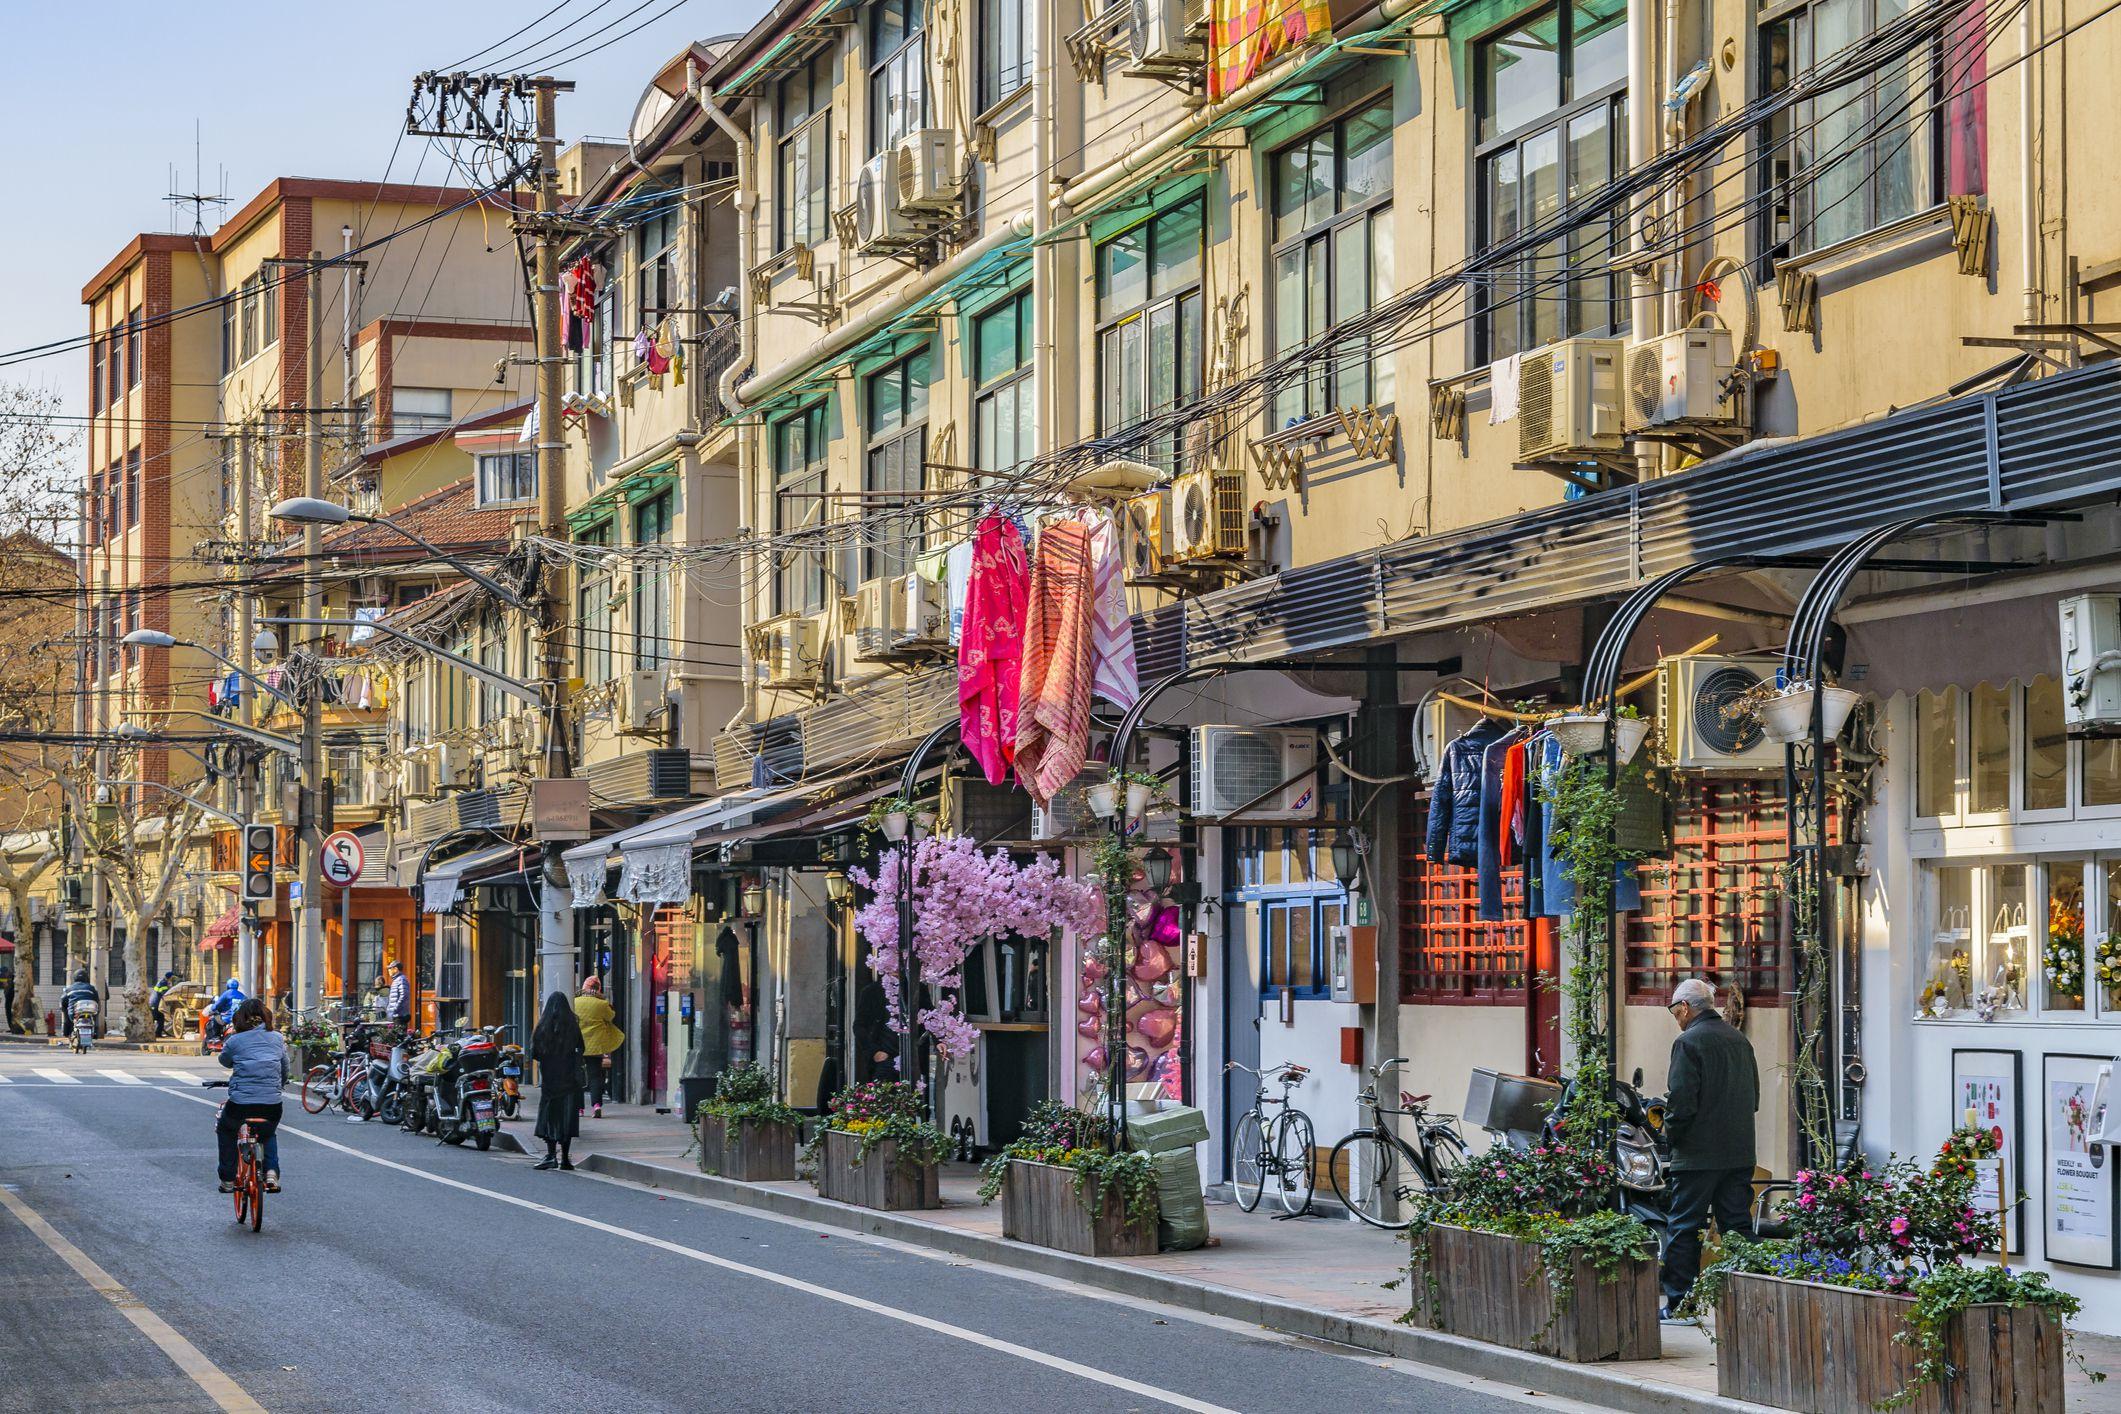 The Top 10 Neighborhoods to Explore in Shanghai